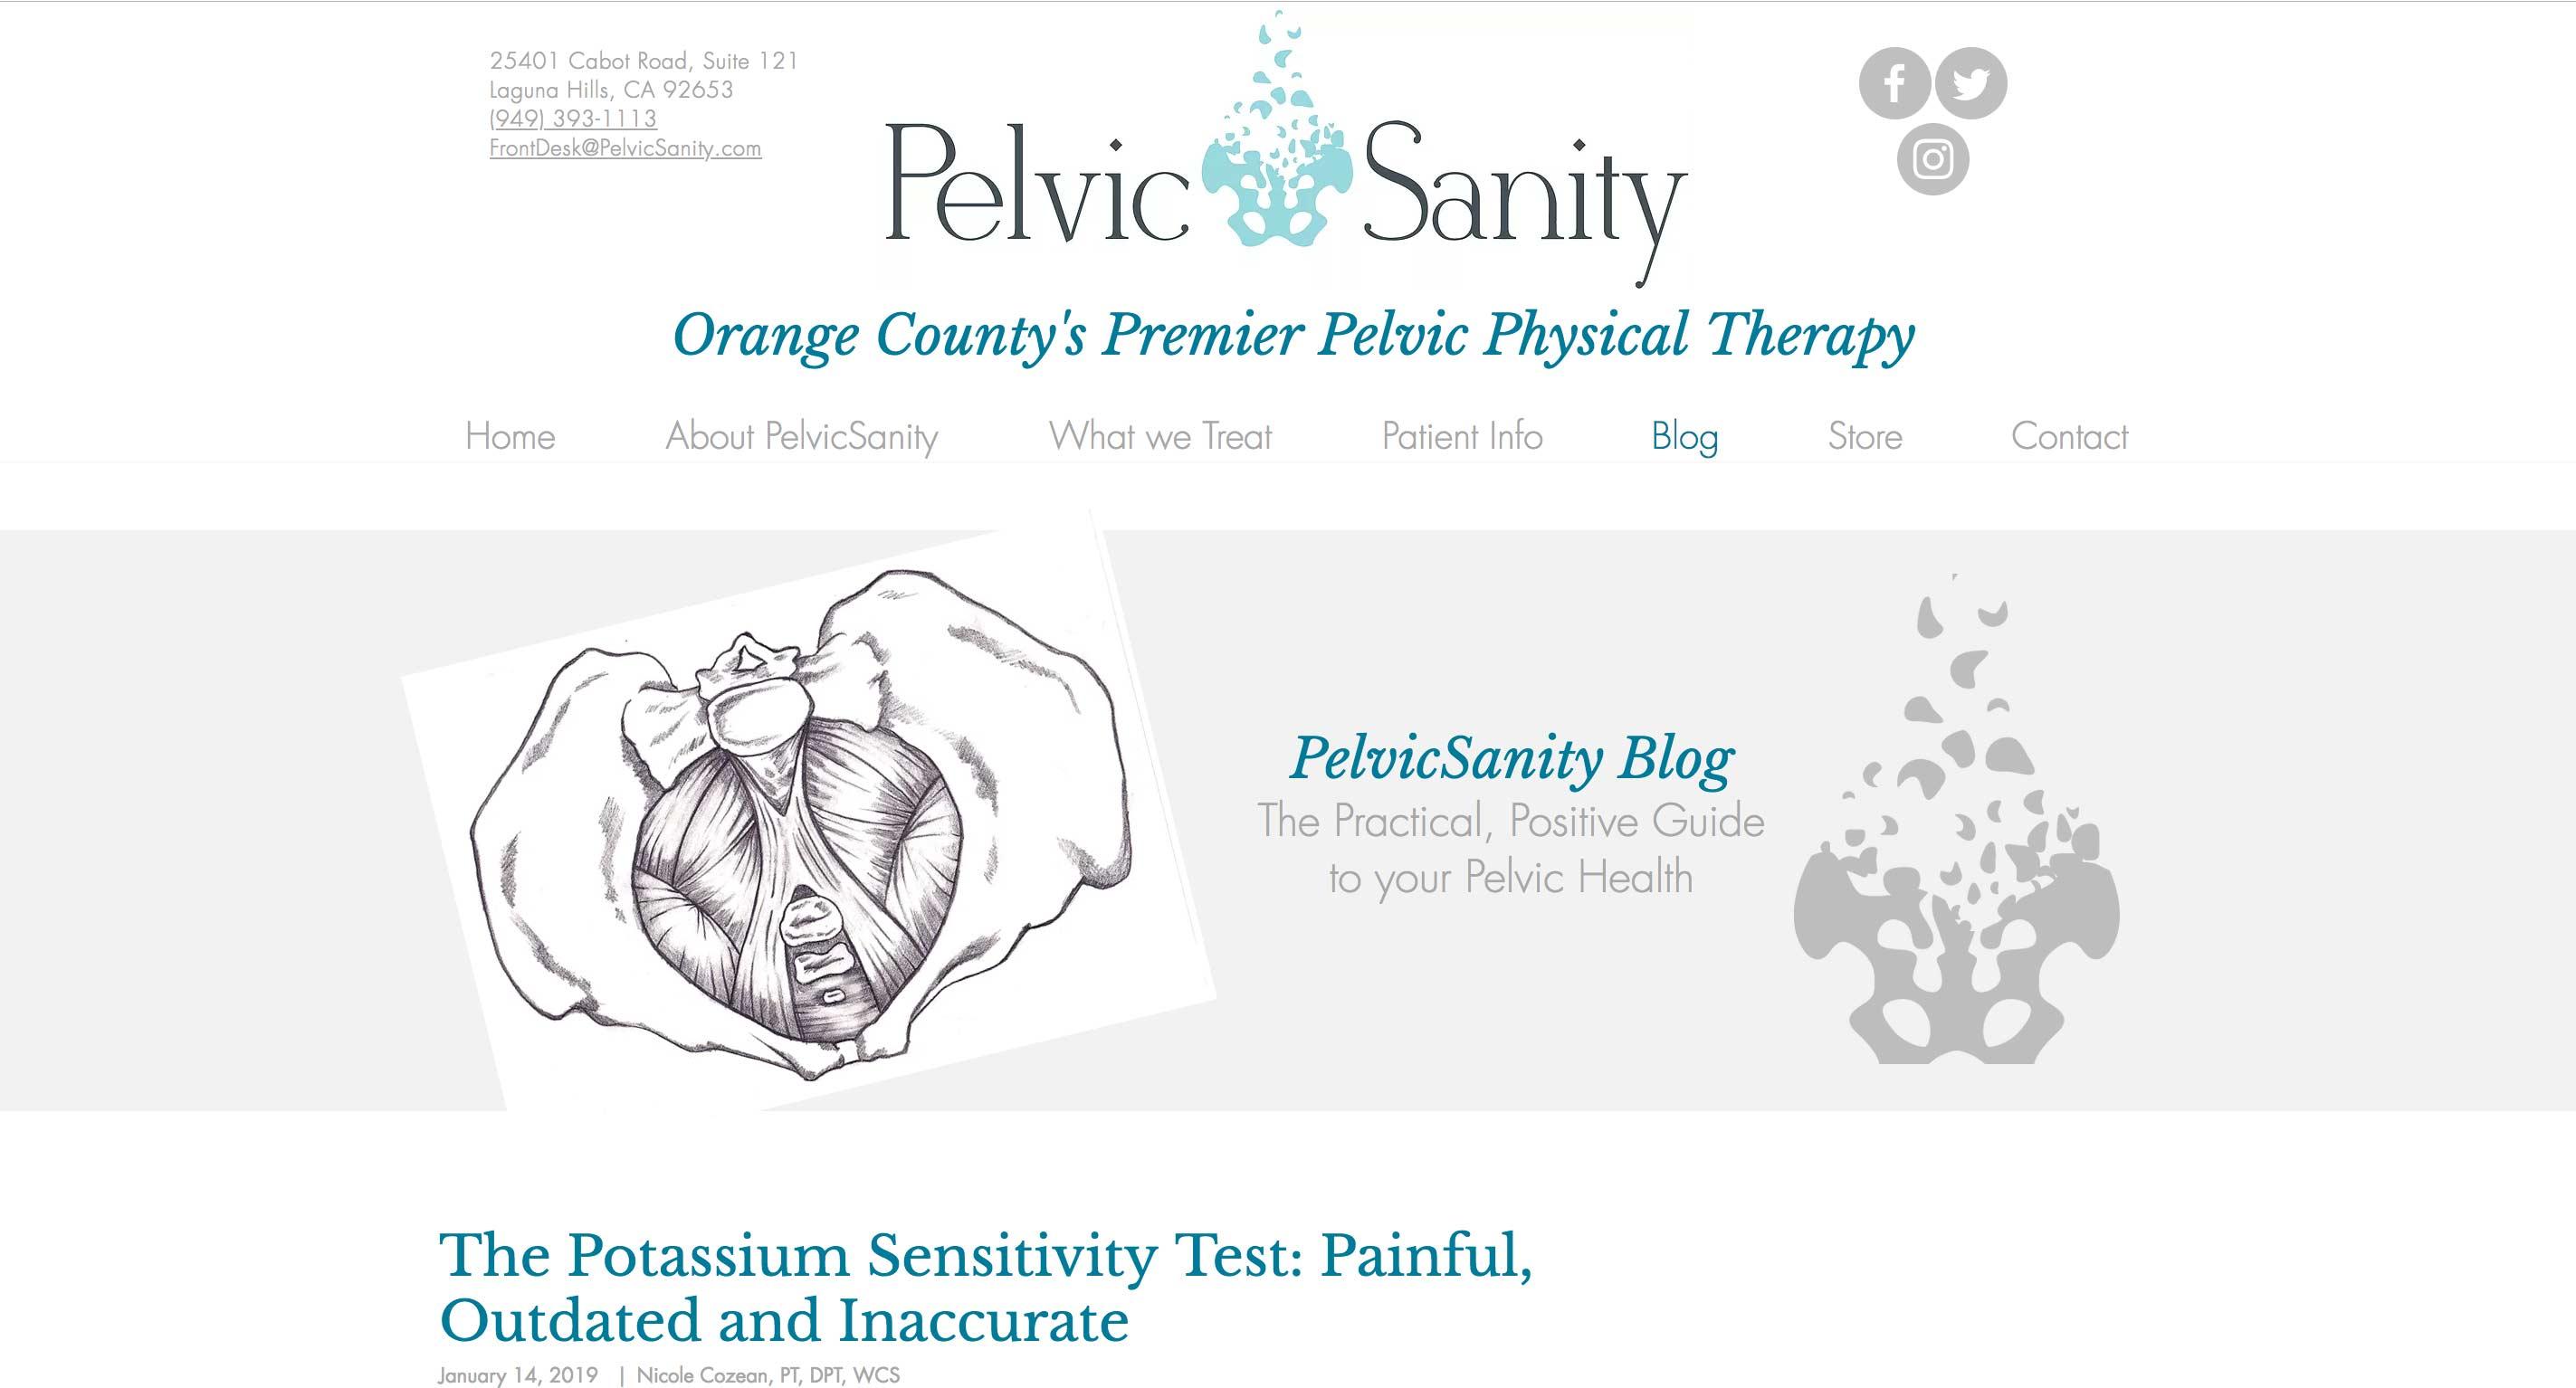 Pelvic Sanity